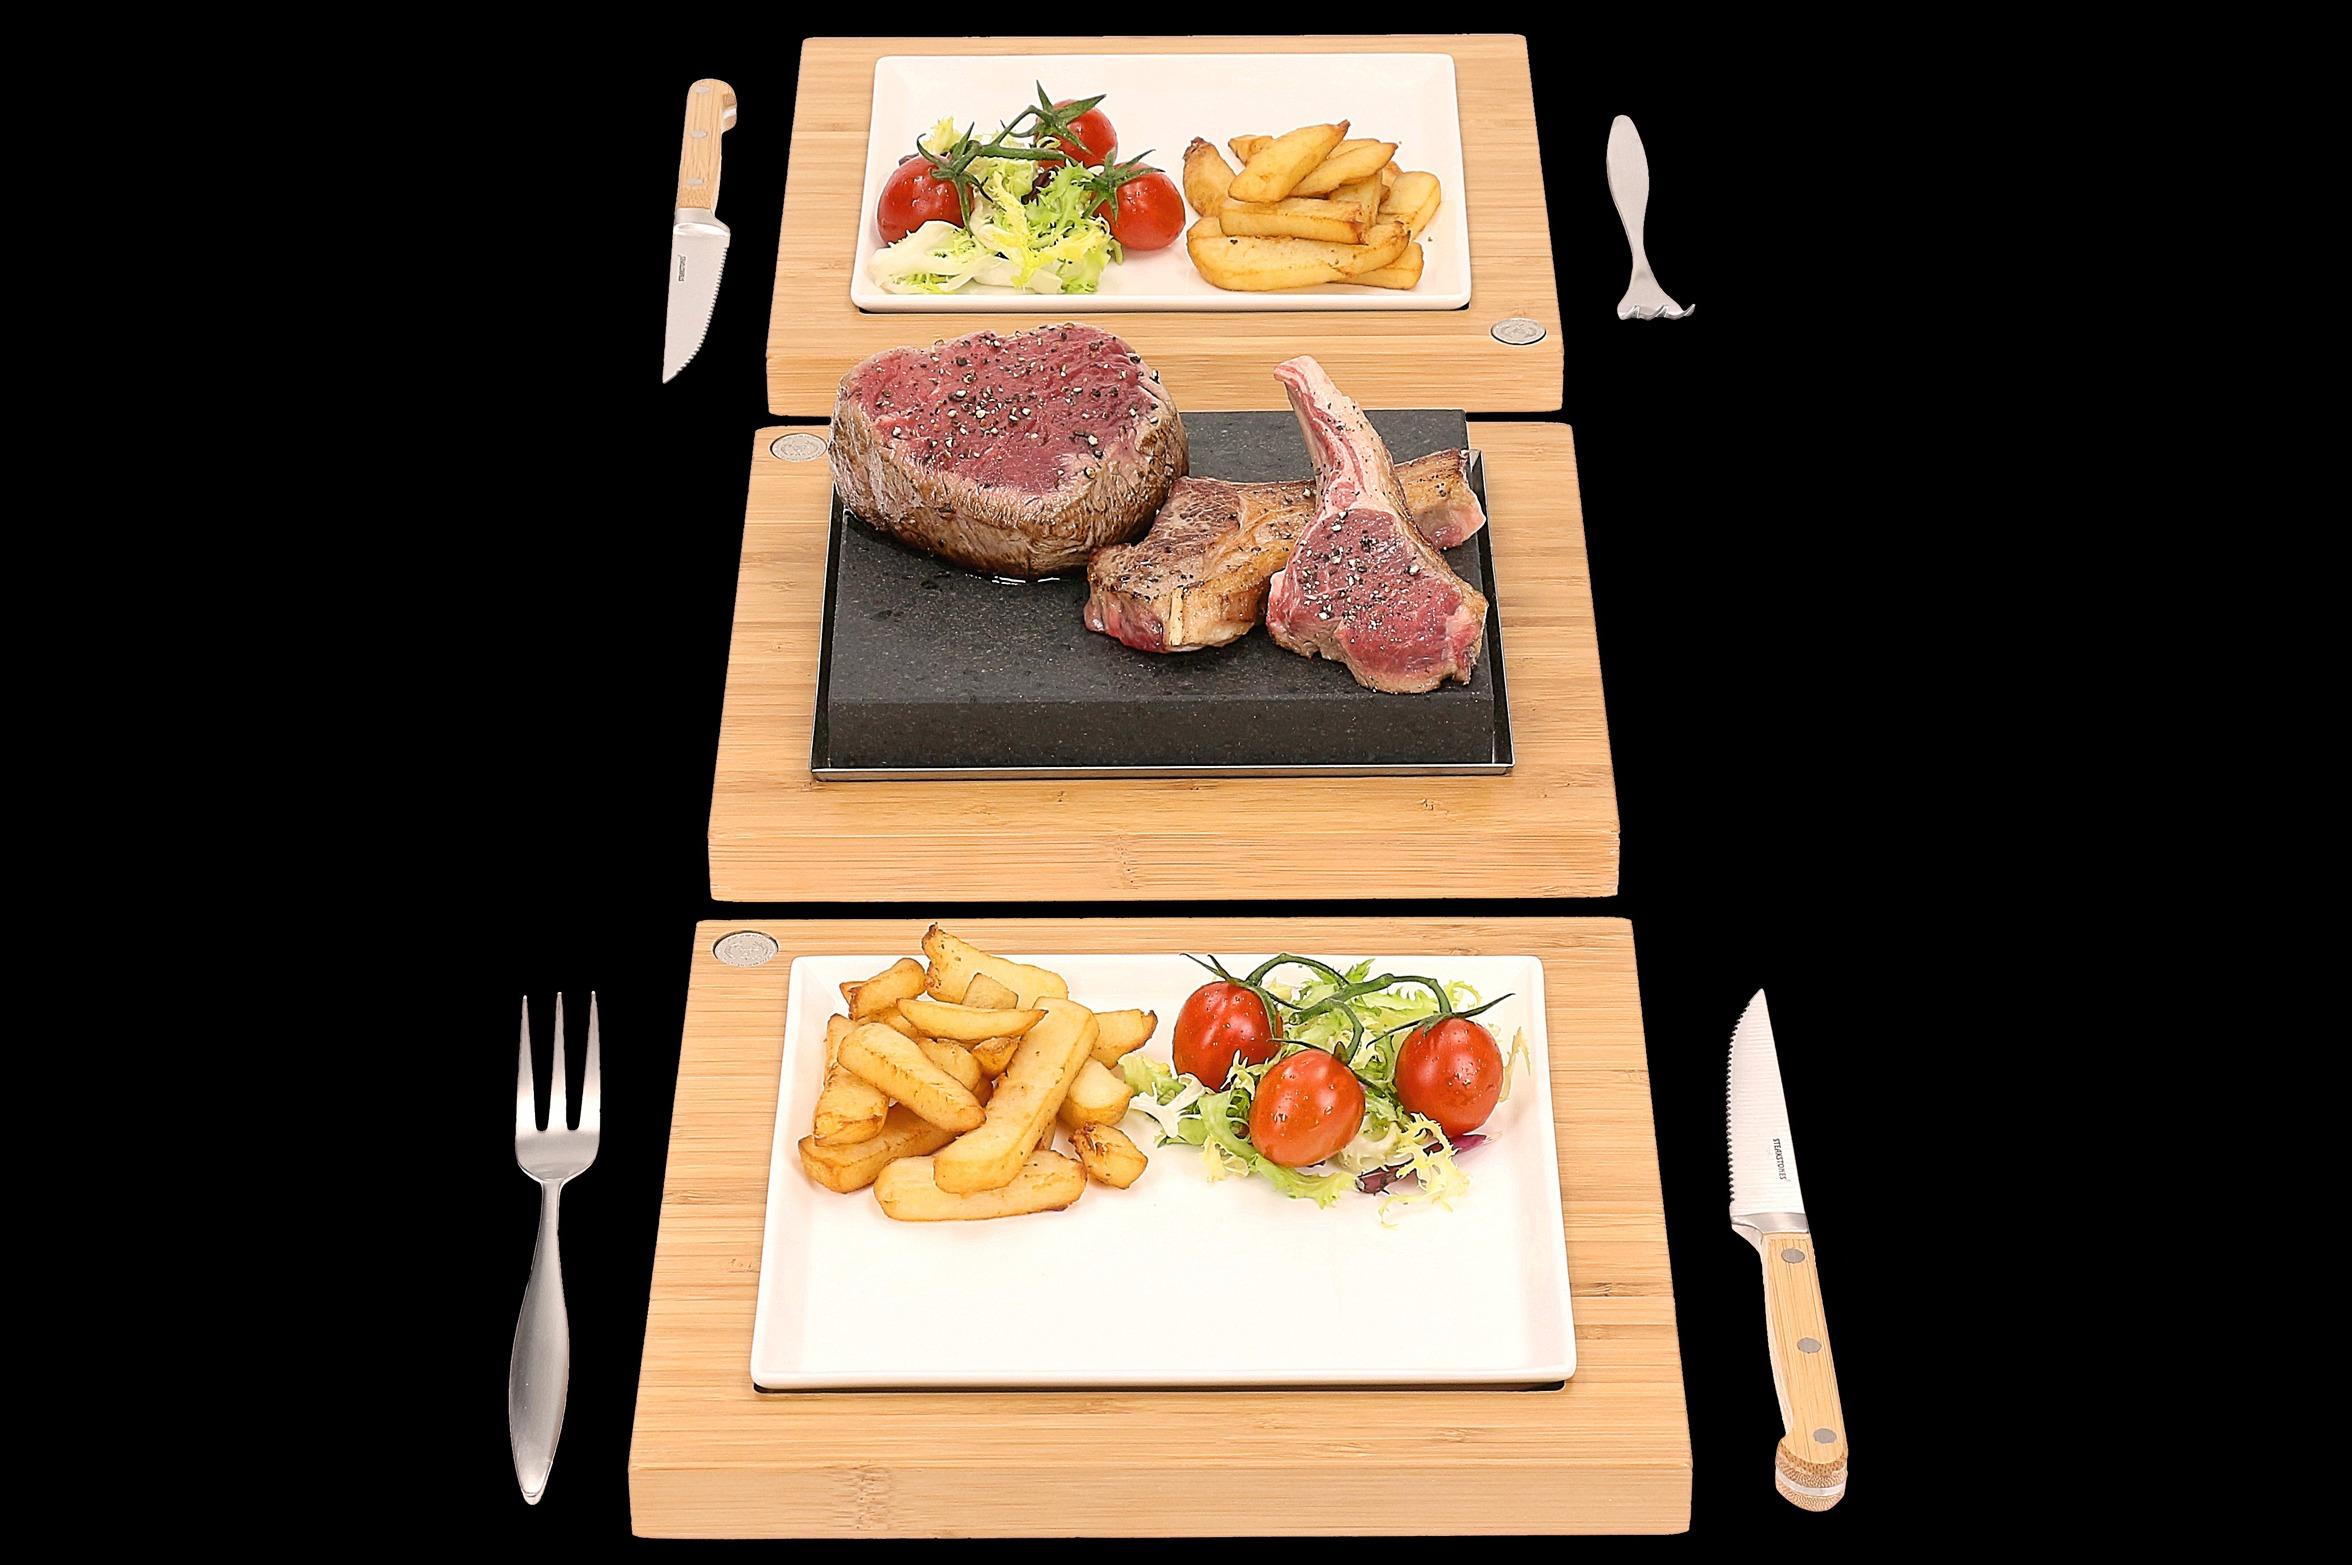 The Steak Plate & Servers Set